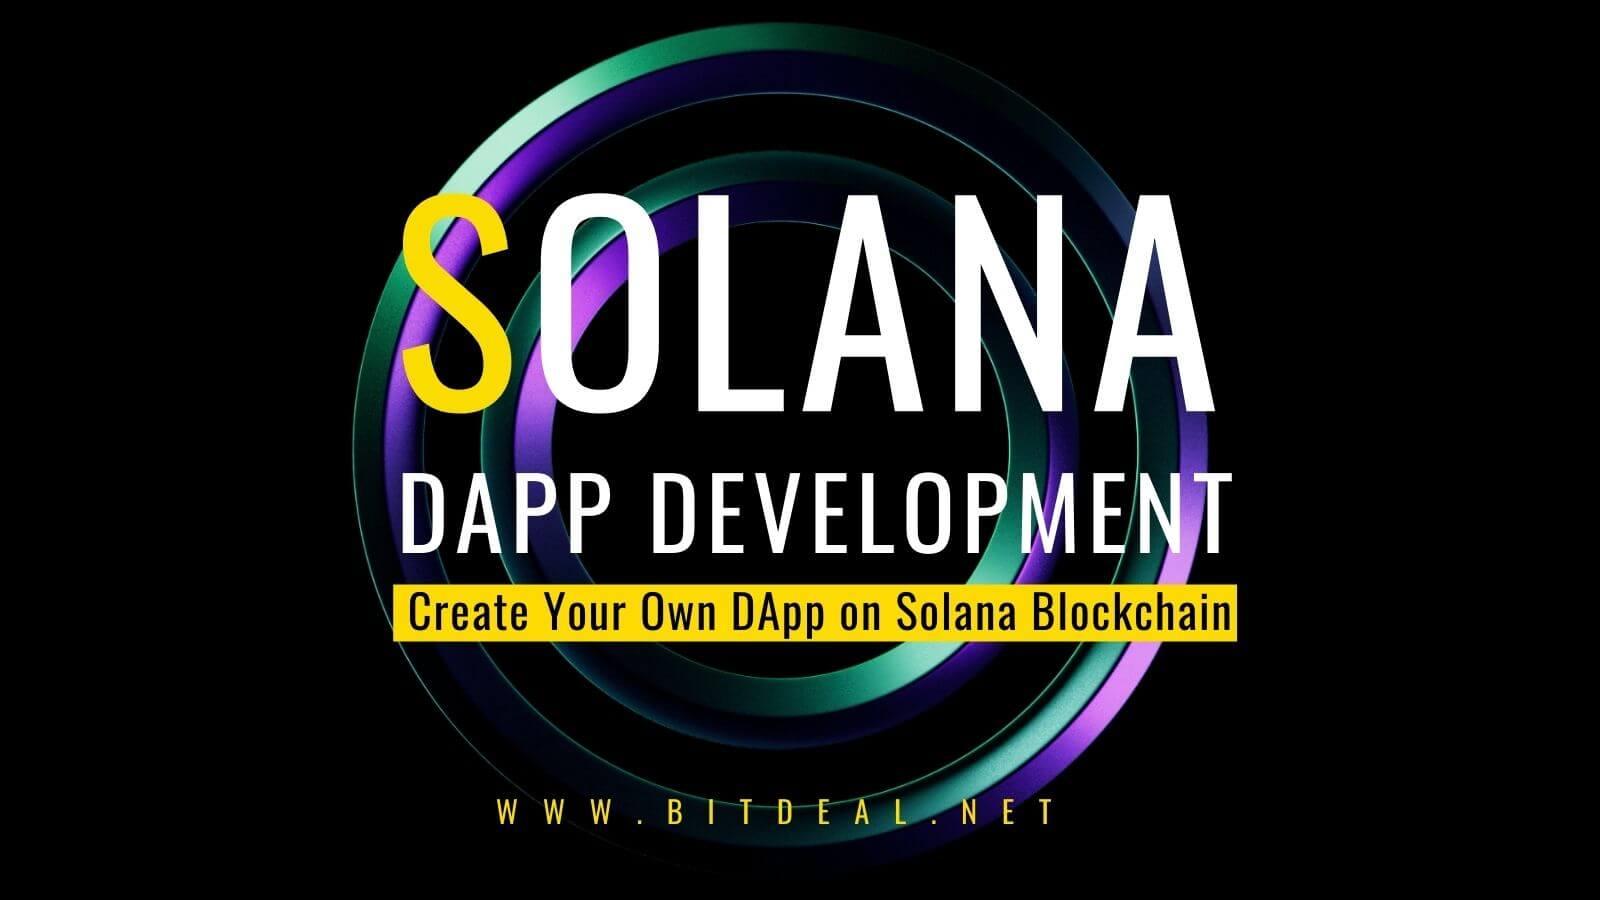 How to create DApps on Solana Blockchain?